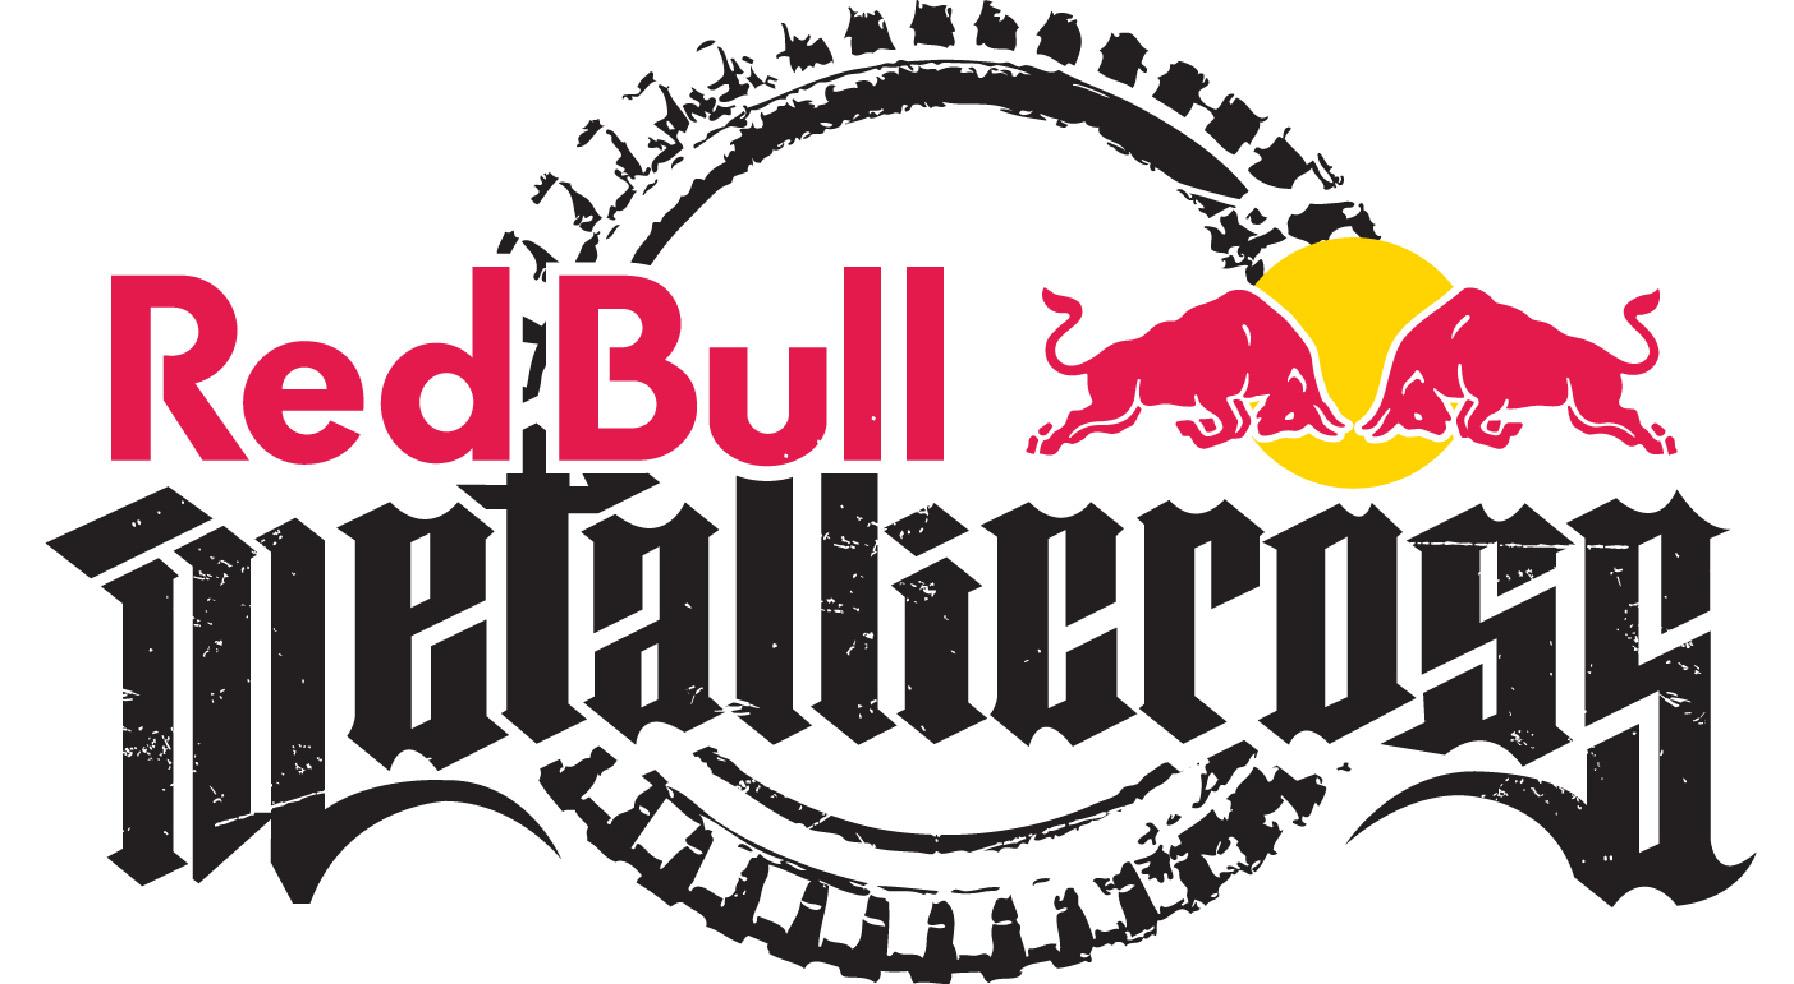 Red bull logos